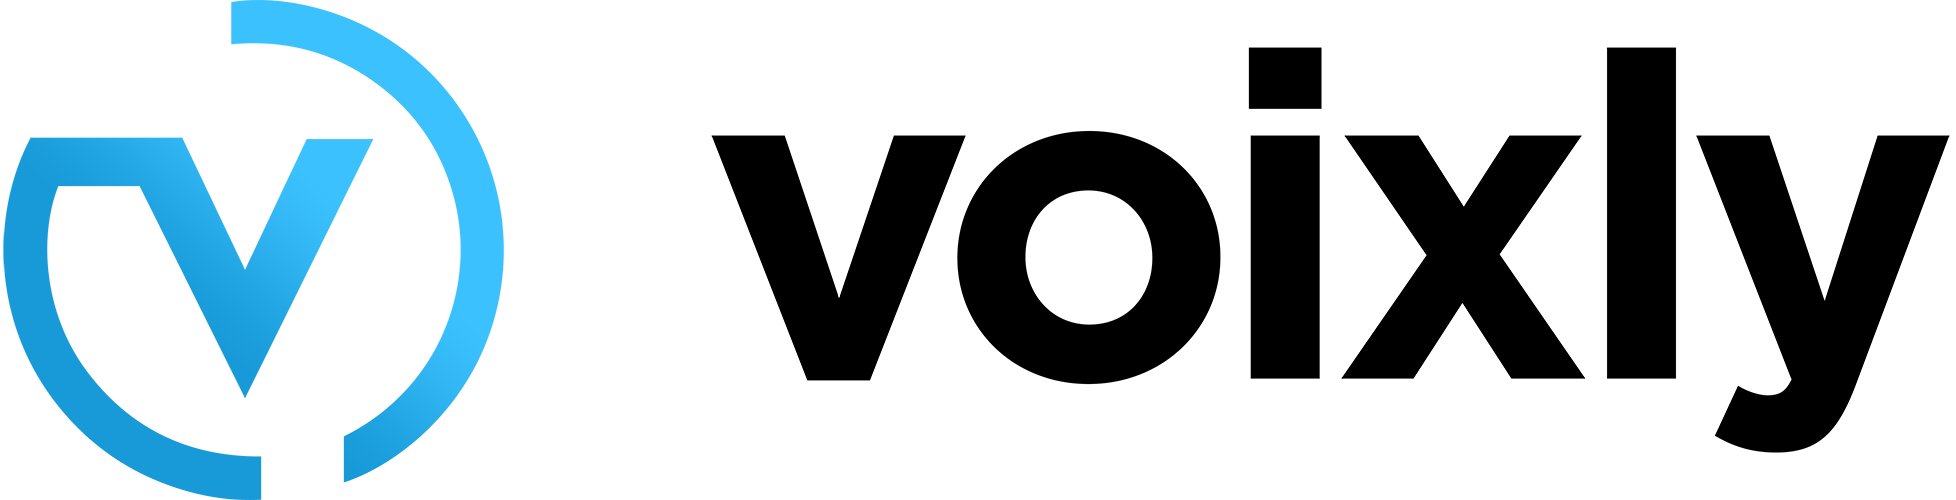 voixly logo new